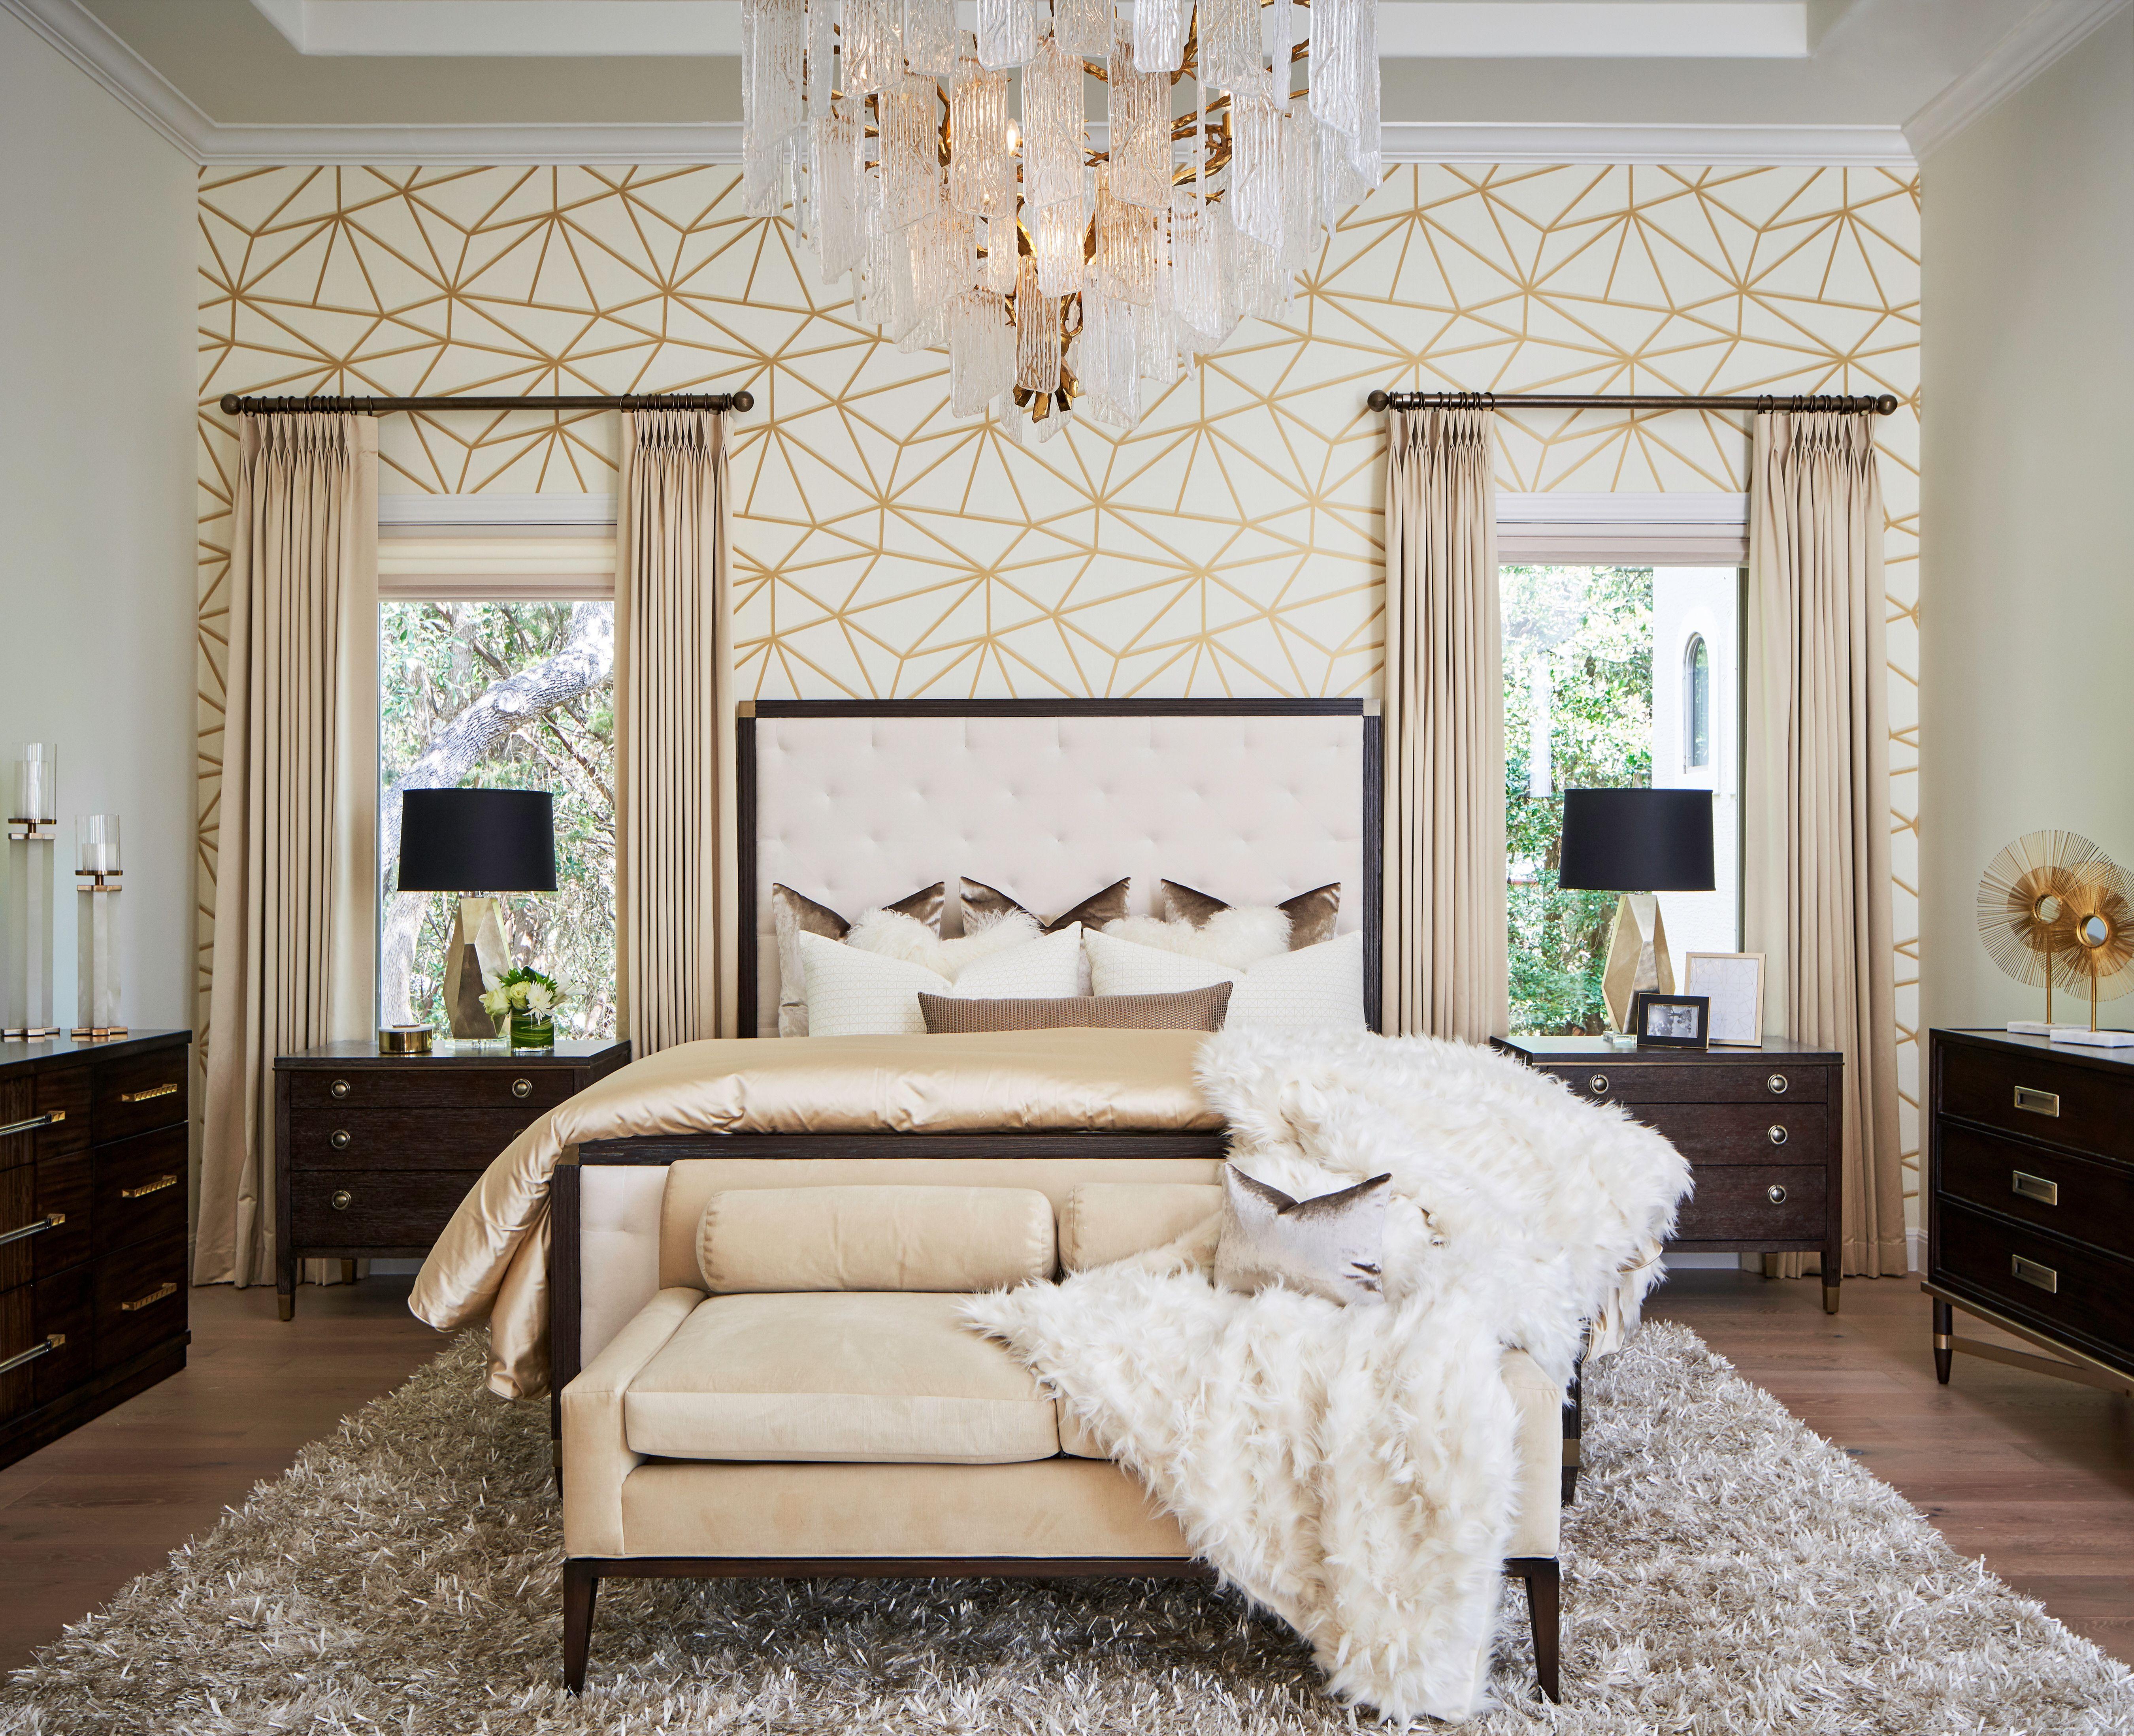 Gold Cream Geometric Wallpaper Dream Master Bedroom Master Bedroom Wallpaper Accent Wall Master Bedroom Accents Bedroom Wallpaper Accent Wall